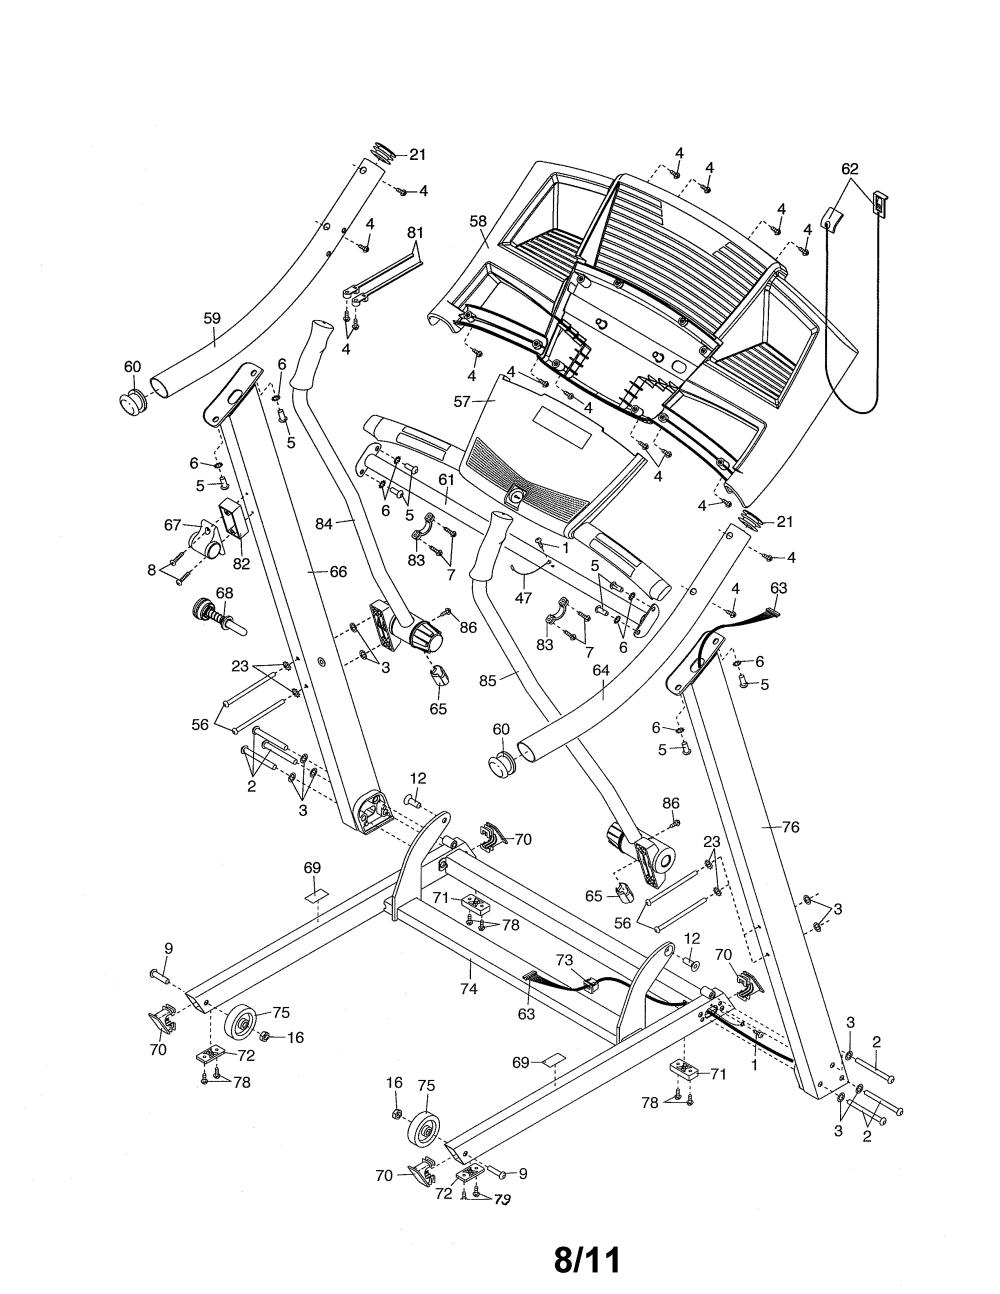 medium resolution of pk5001a centurylink phone line wiring diagram rh langitmendung netlib re and telephone wiring tip ring home